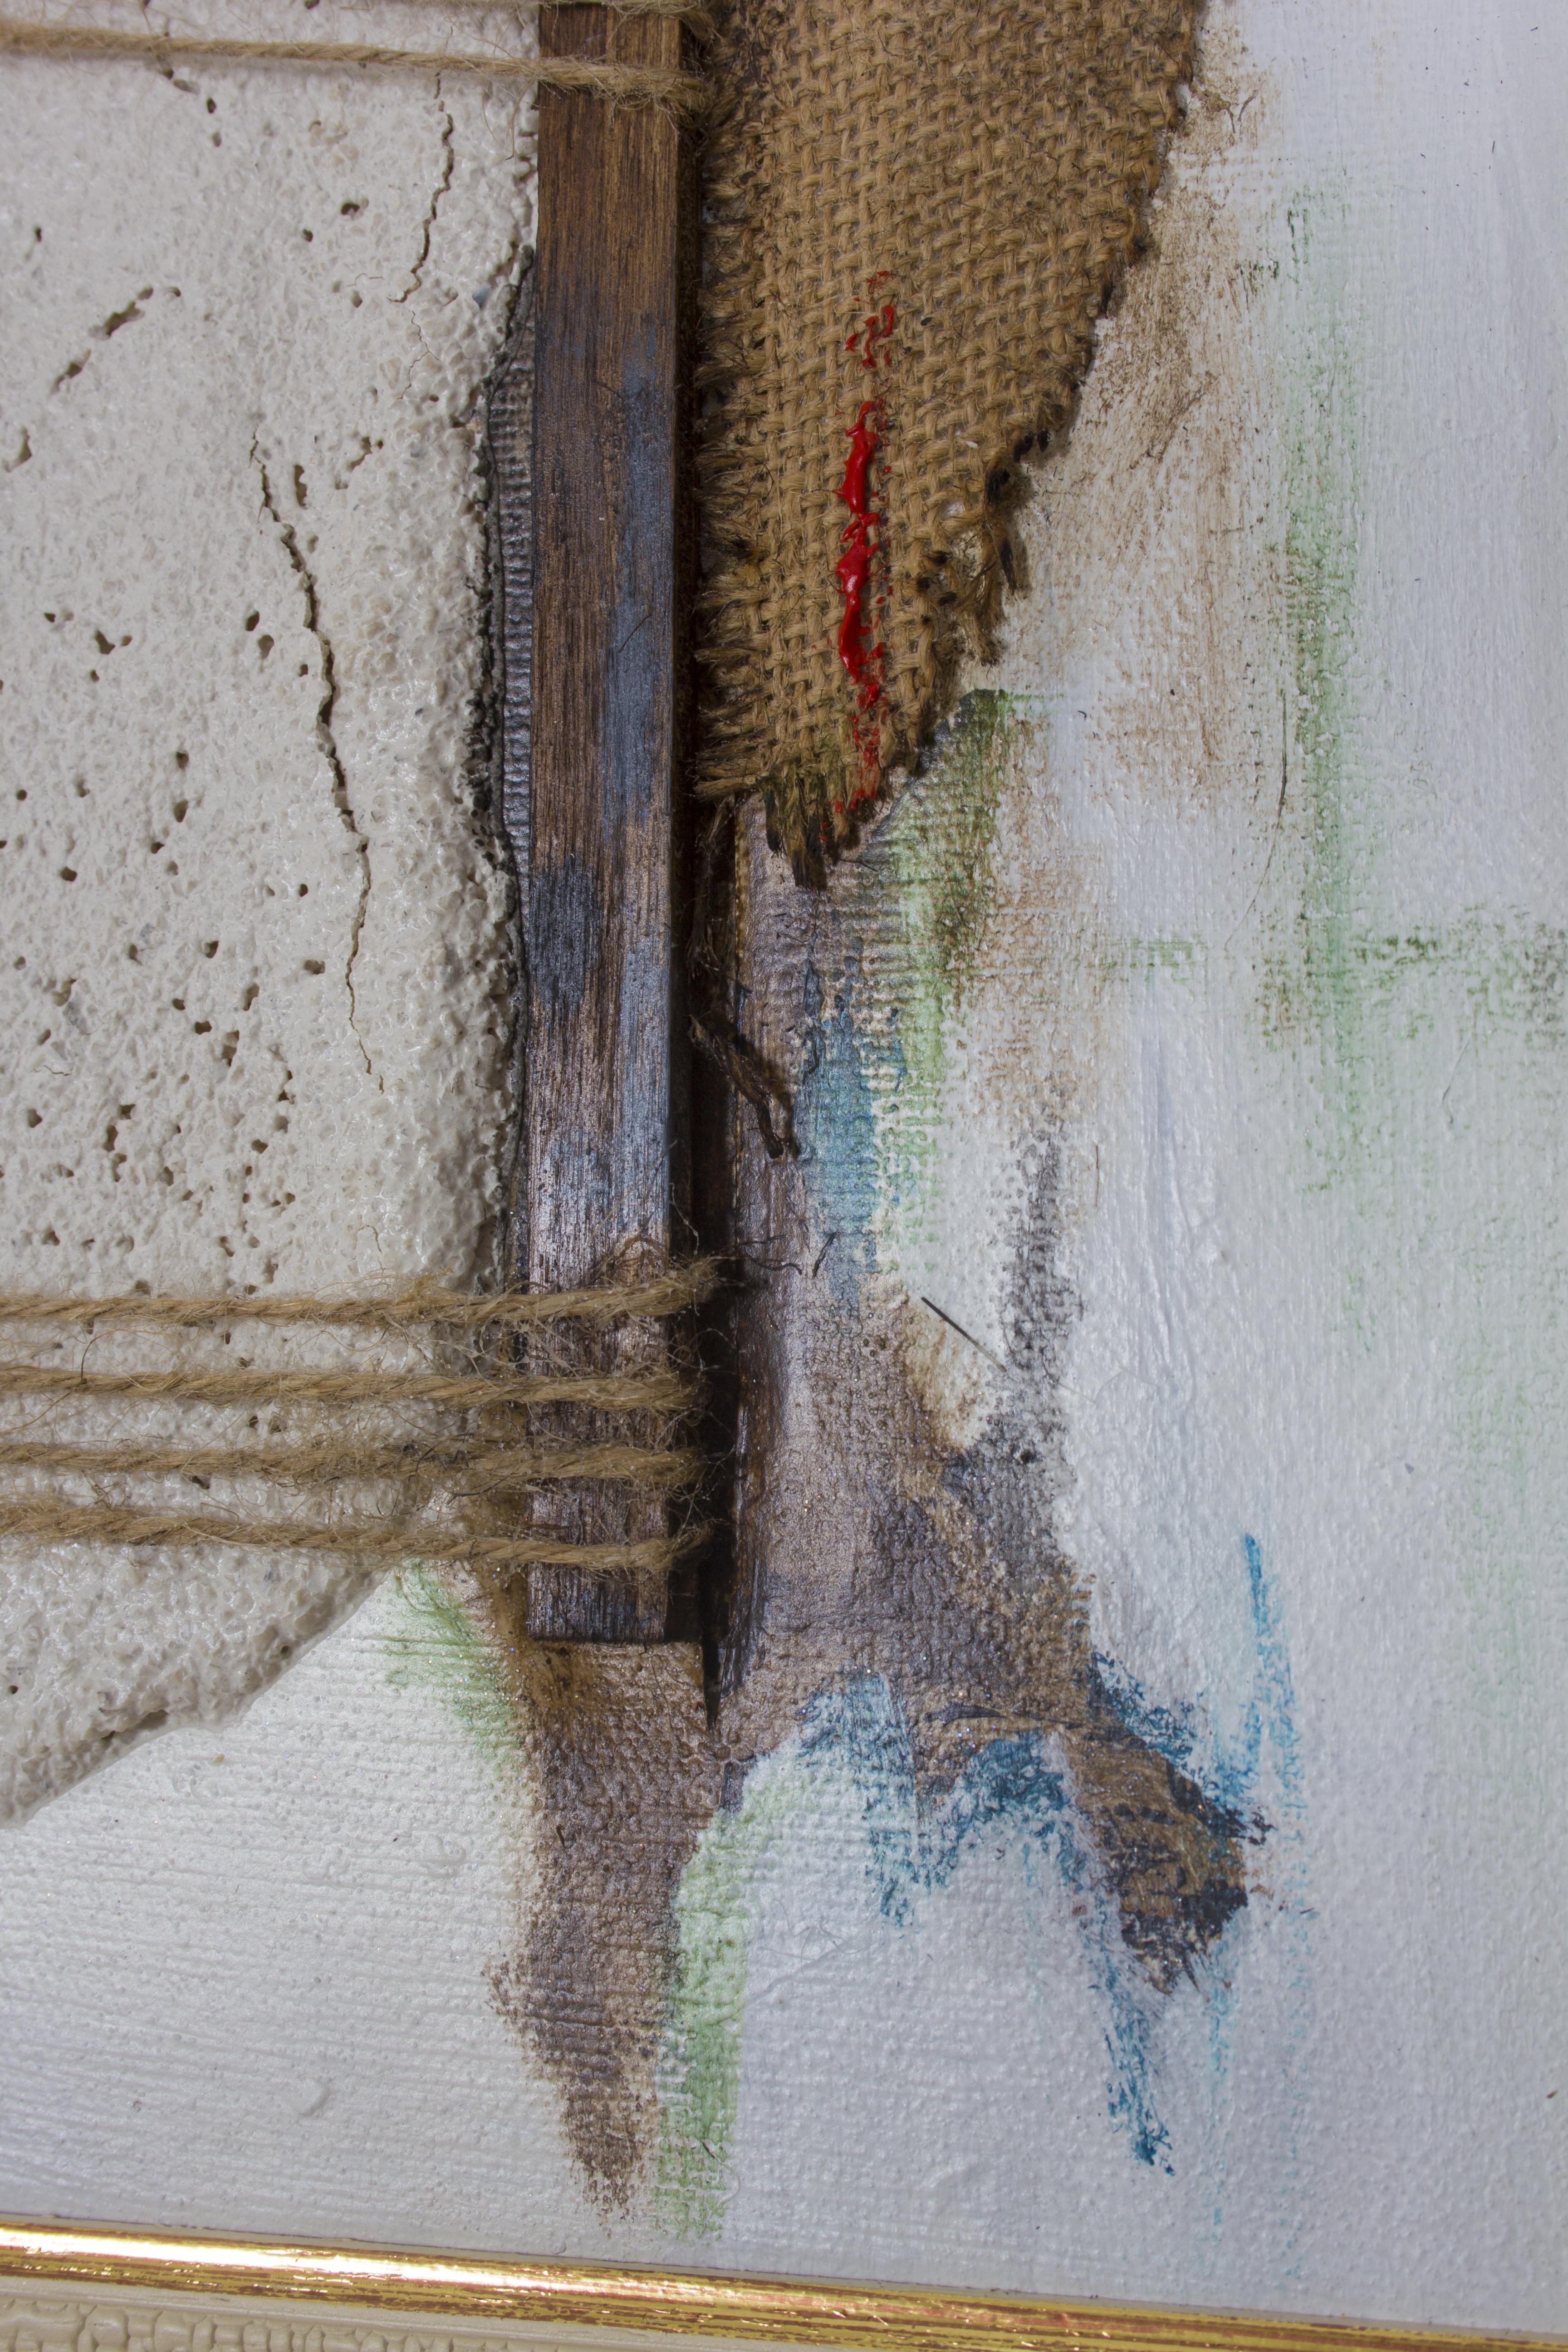 Ciccozzi, arte contemporanea